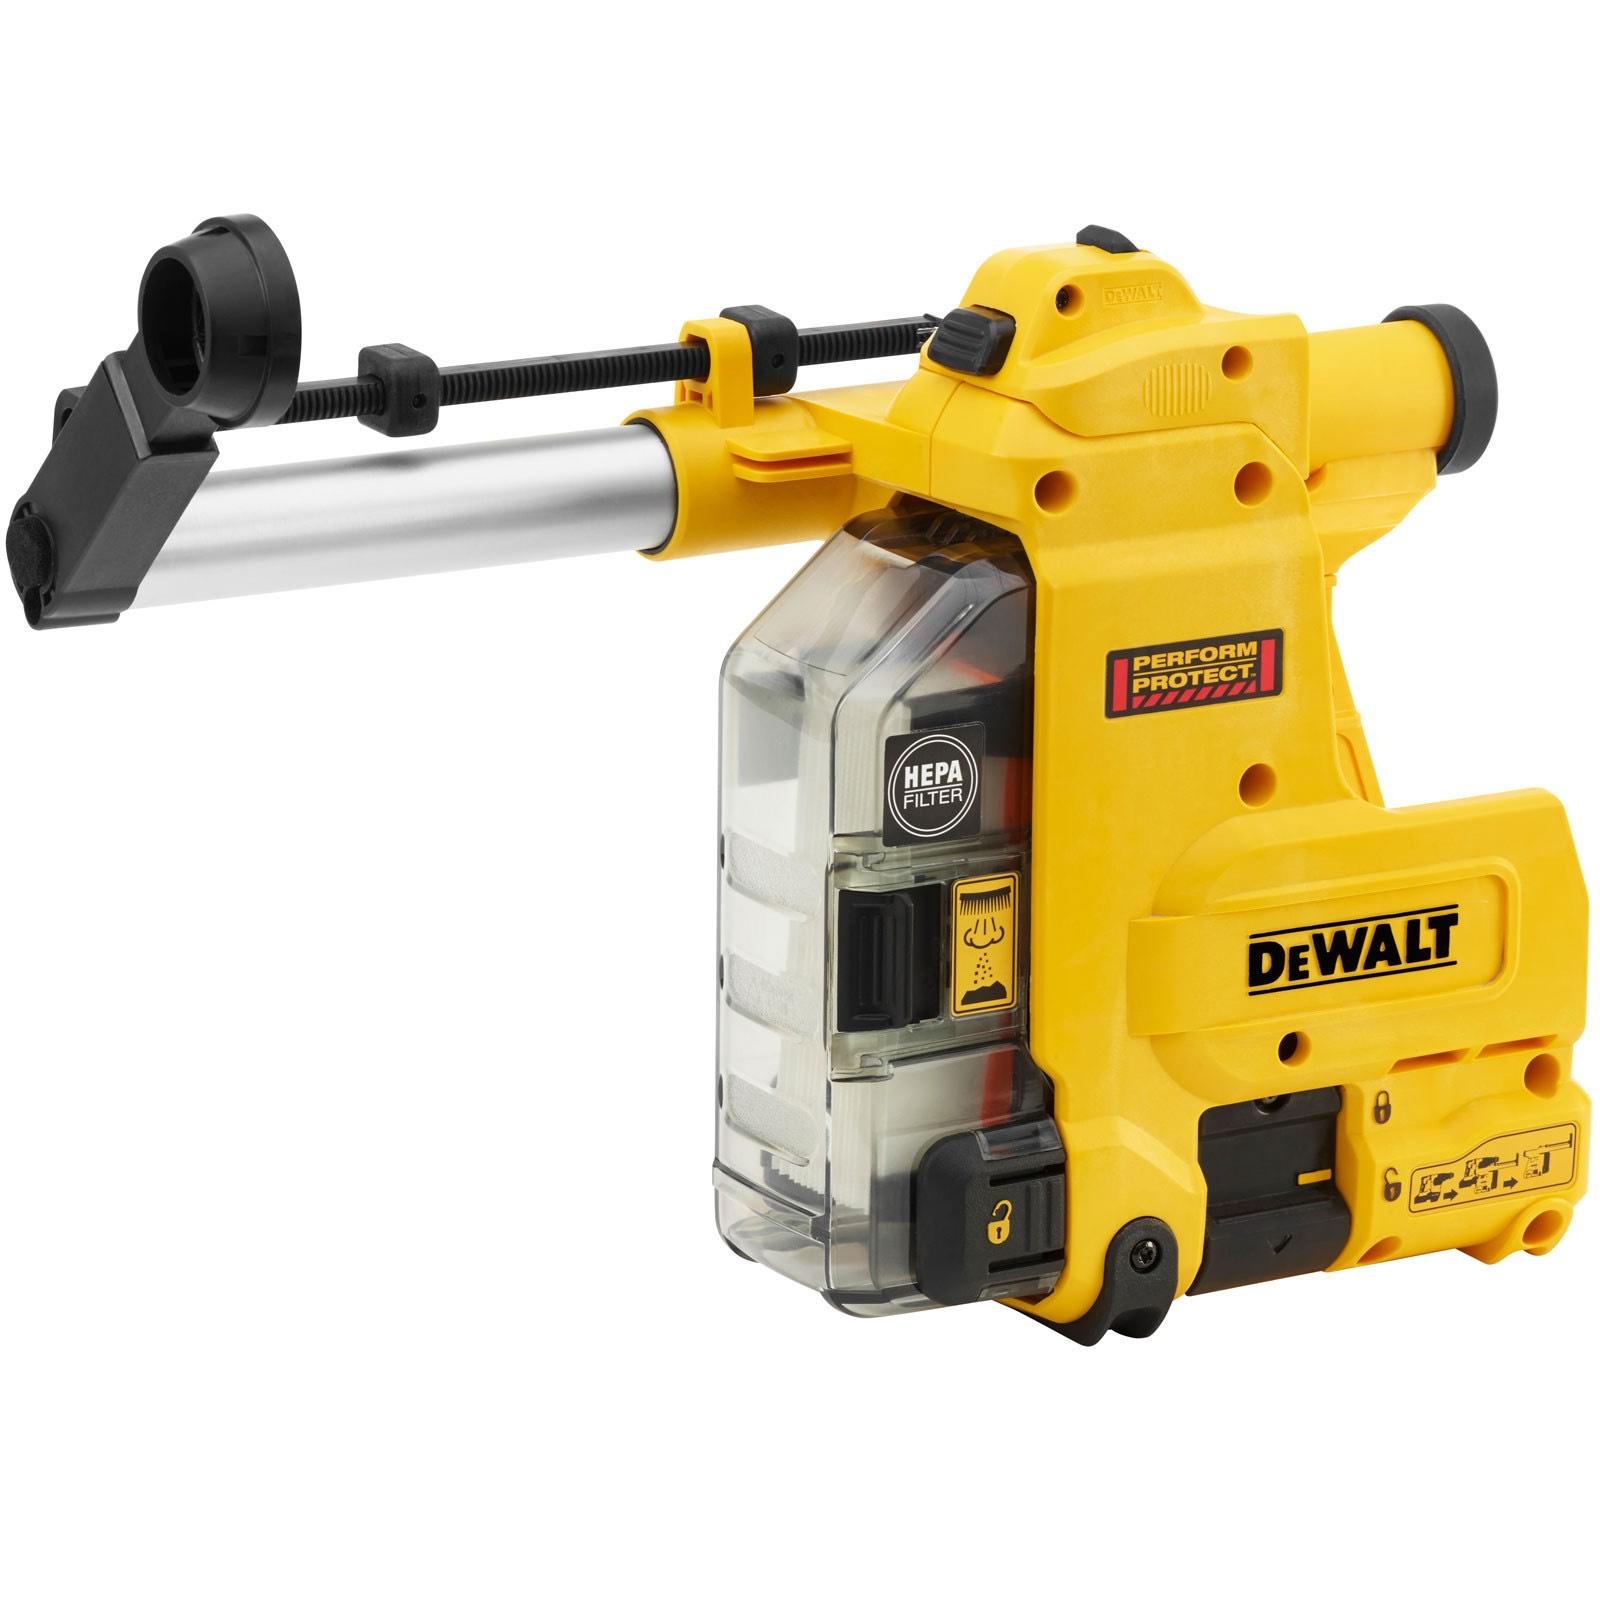 Dewalt d25304dh-xj dust extractor - £102.52 (with code) @ eBay / buyaparcel-store